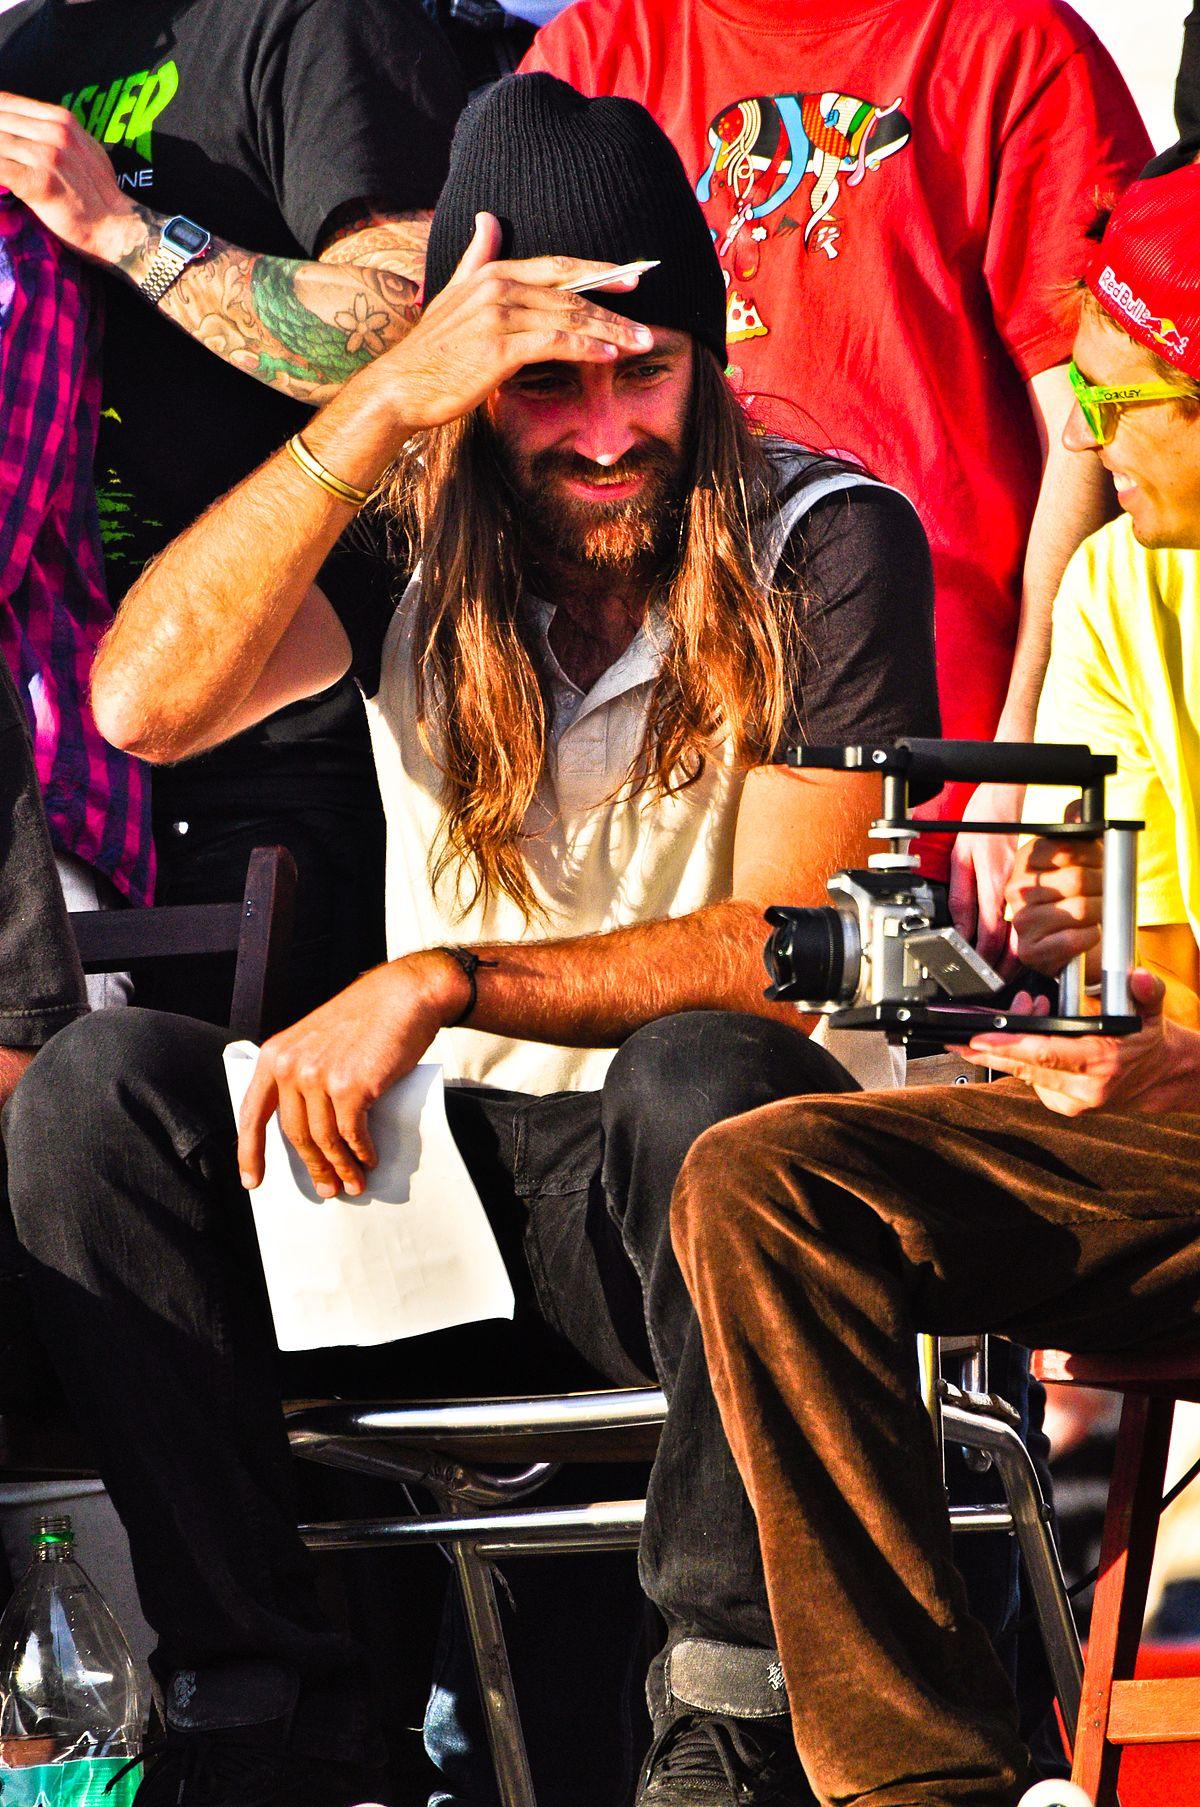 Chris Haslam Skateboarder Wikipedia